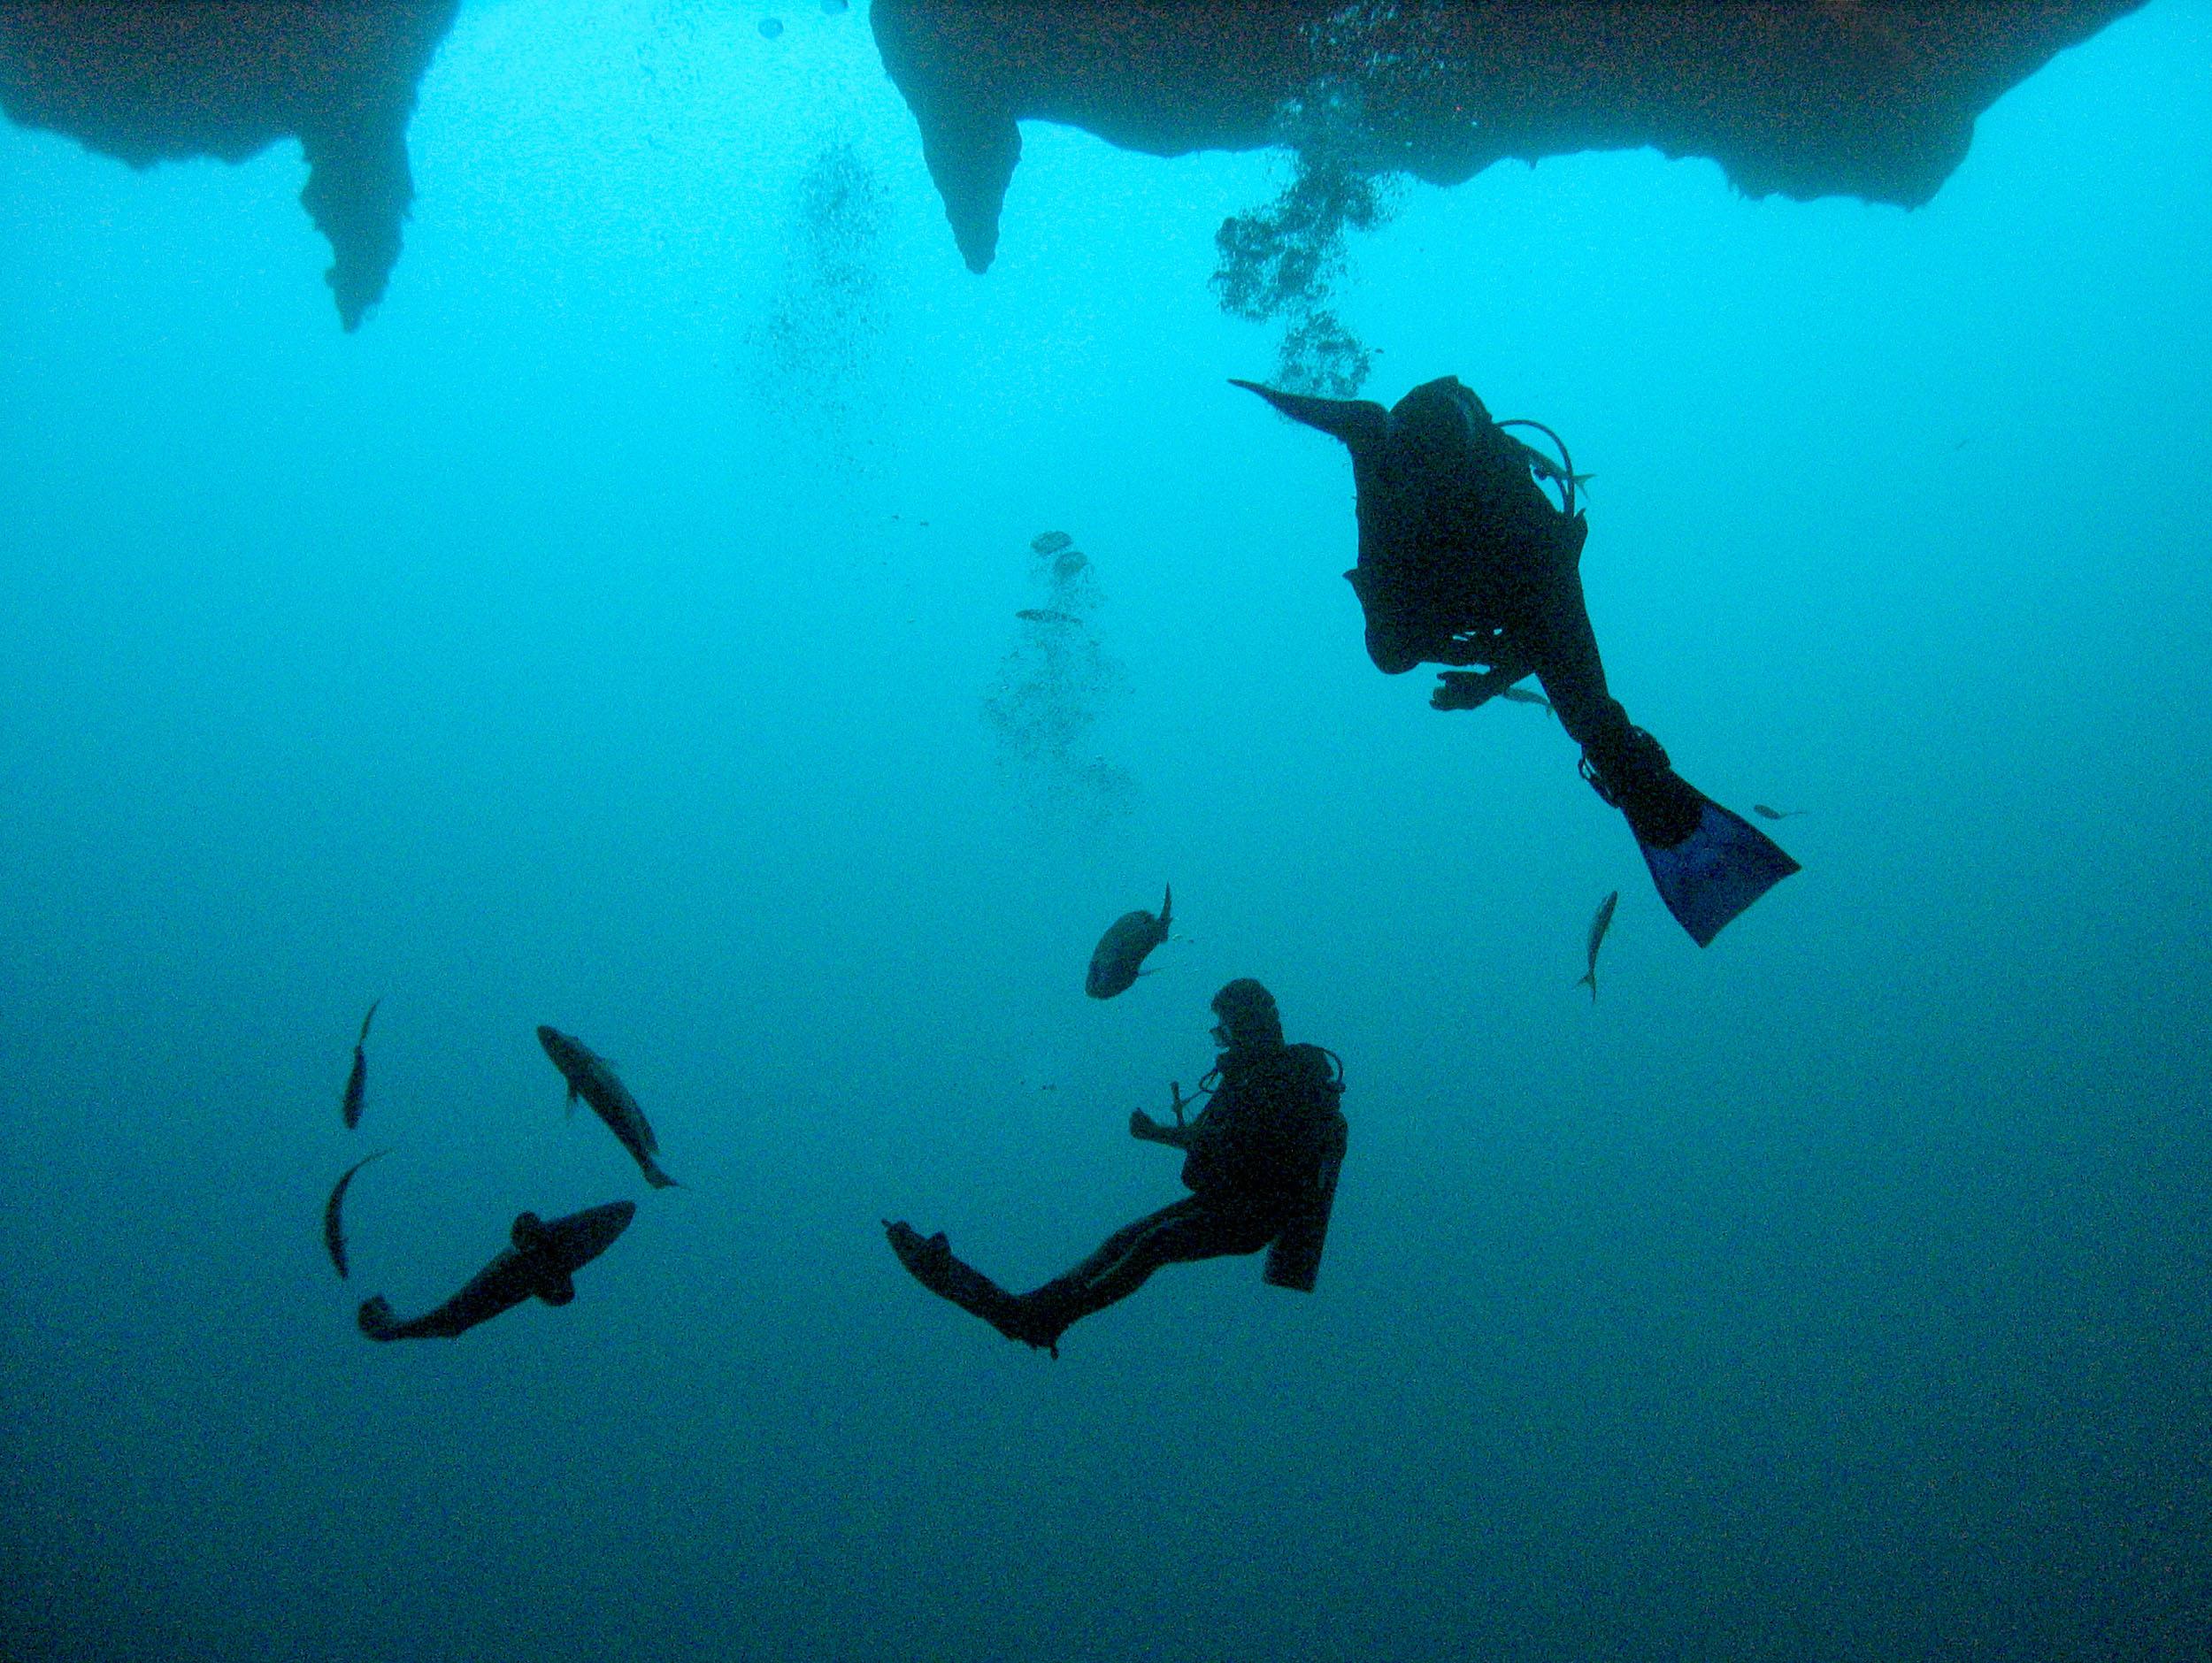 Muerte en el Blue Hole - Belize Cayes Foro